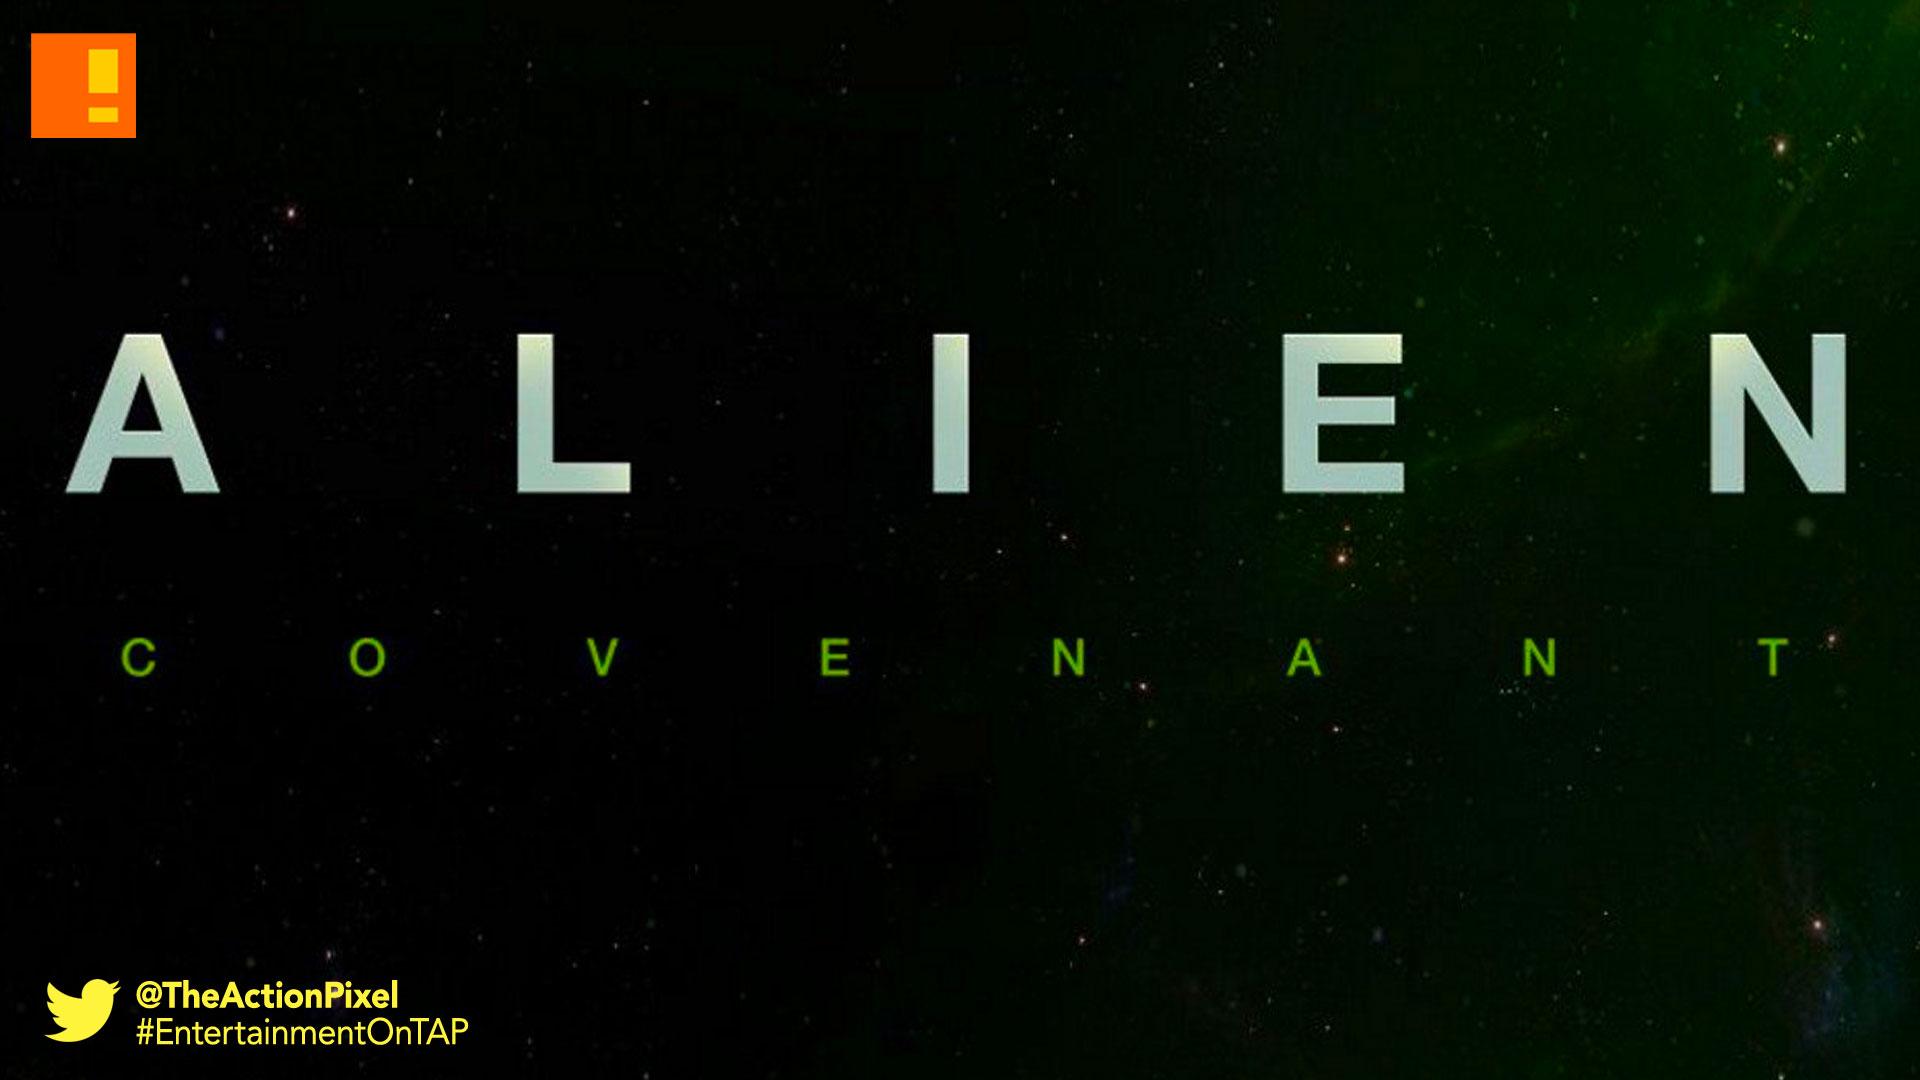 alien: covenant, alien, covenant, ridley scott, neomorph, xenomorph, entertainment on tap, the action pixel